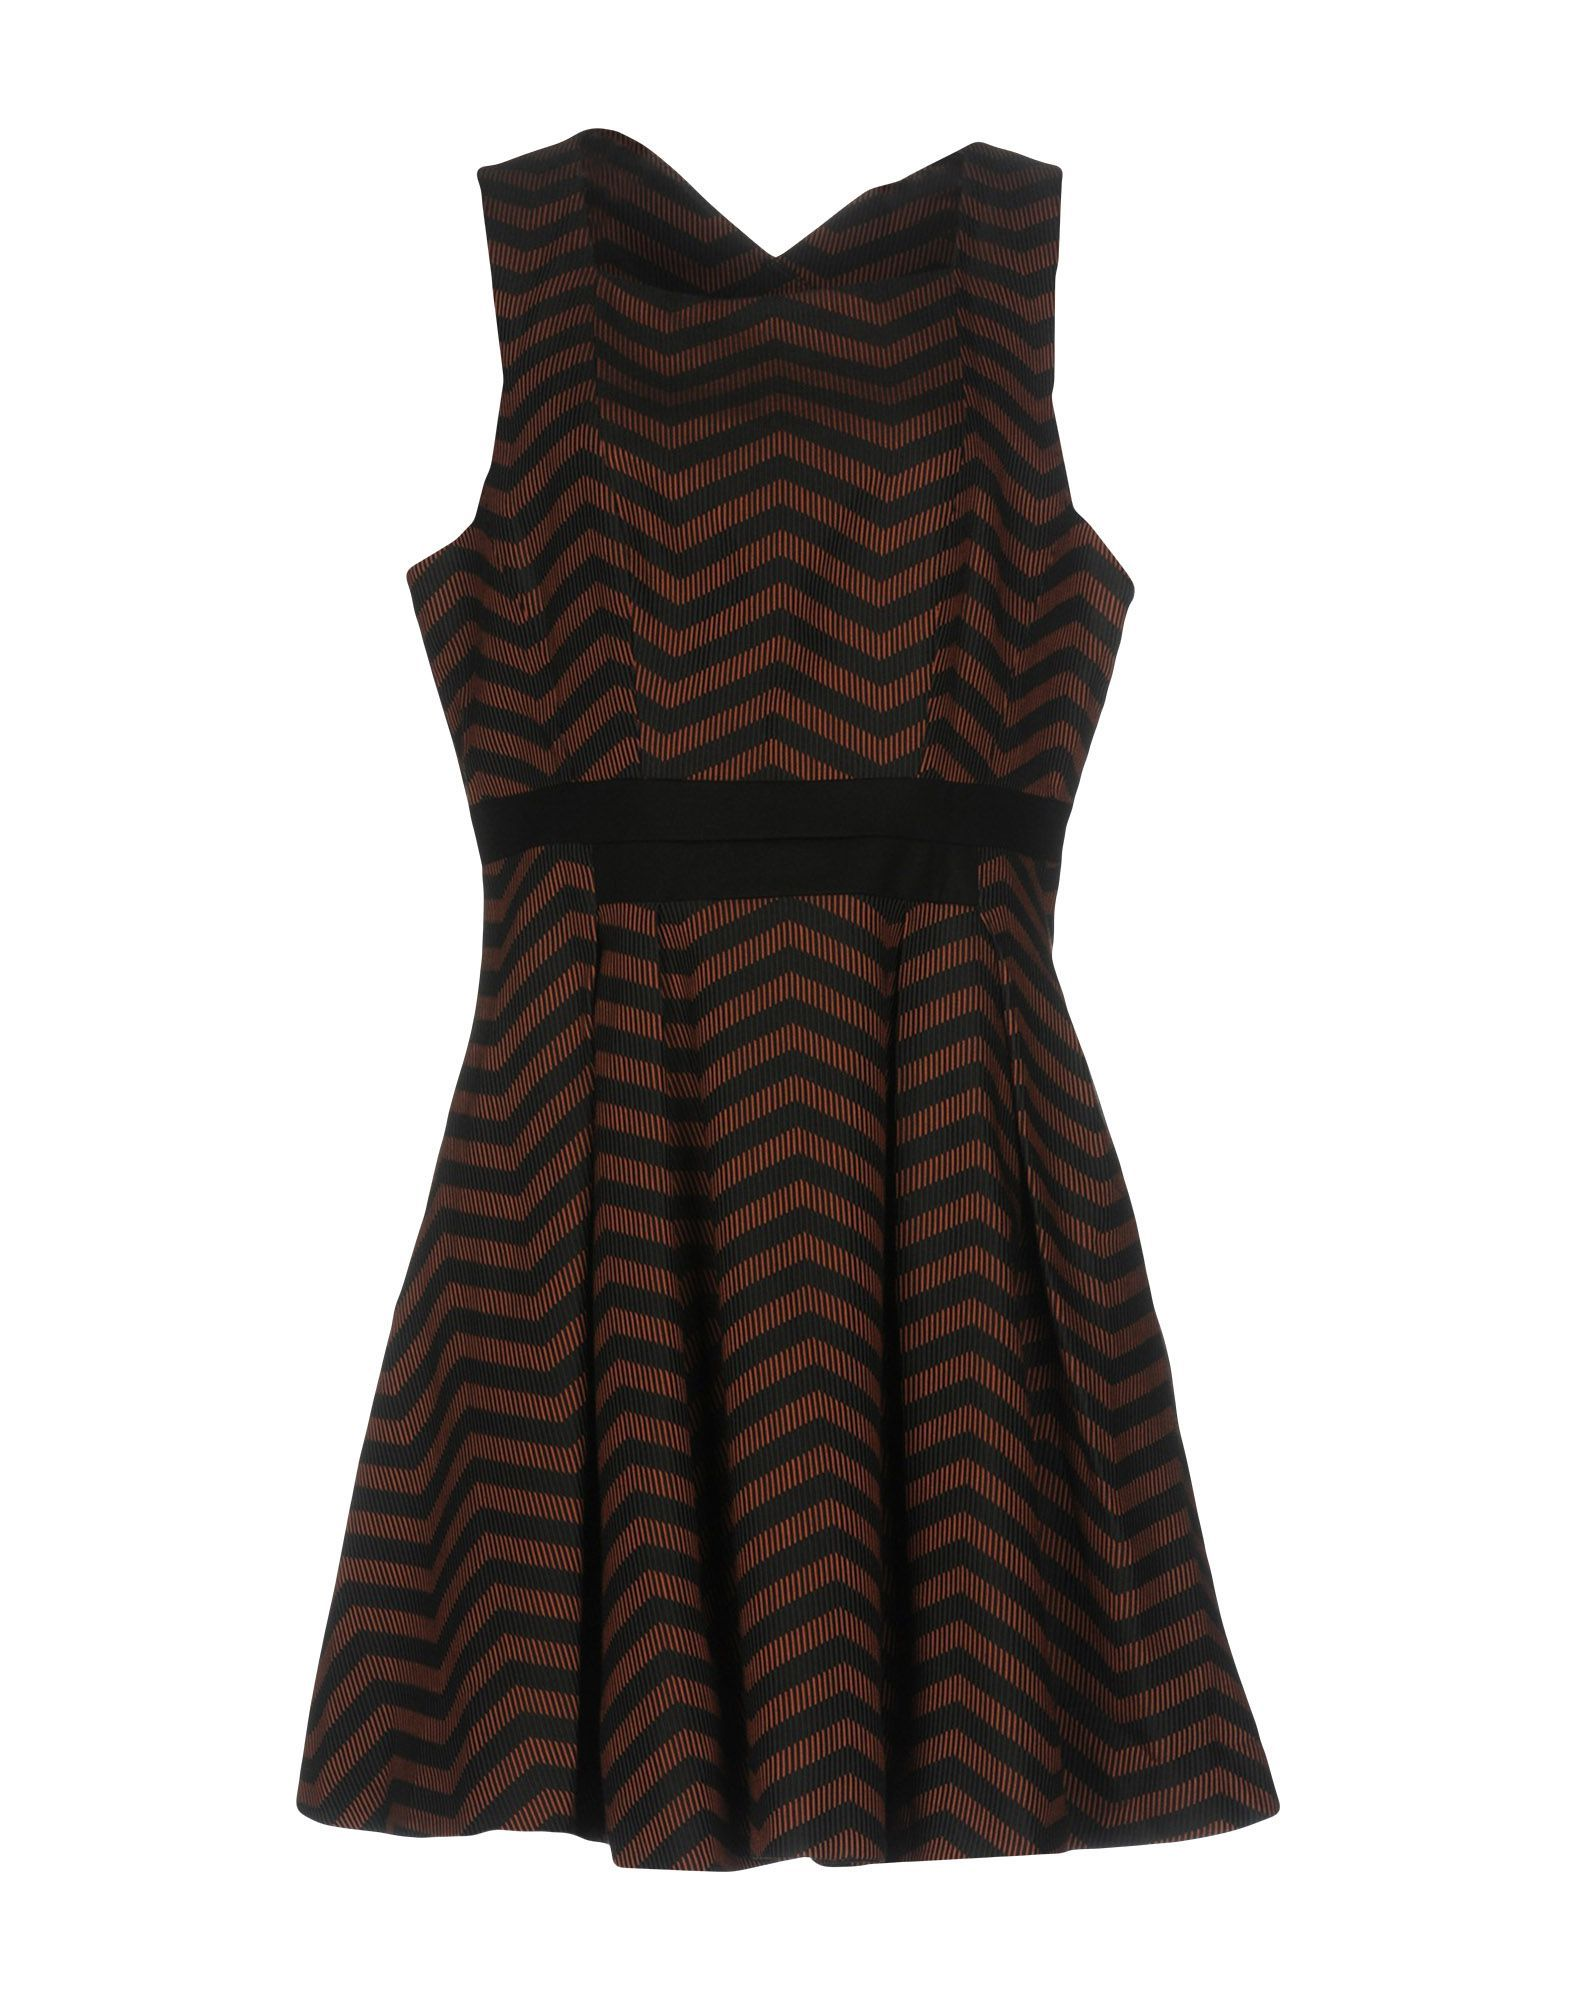 Karen Millen Brown Stripe Sleeveless Dress